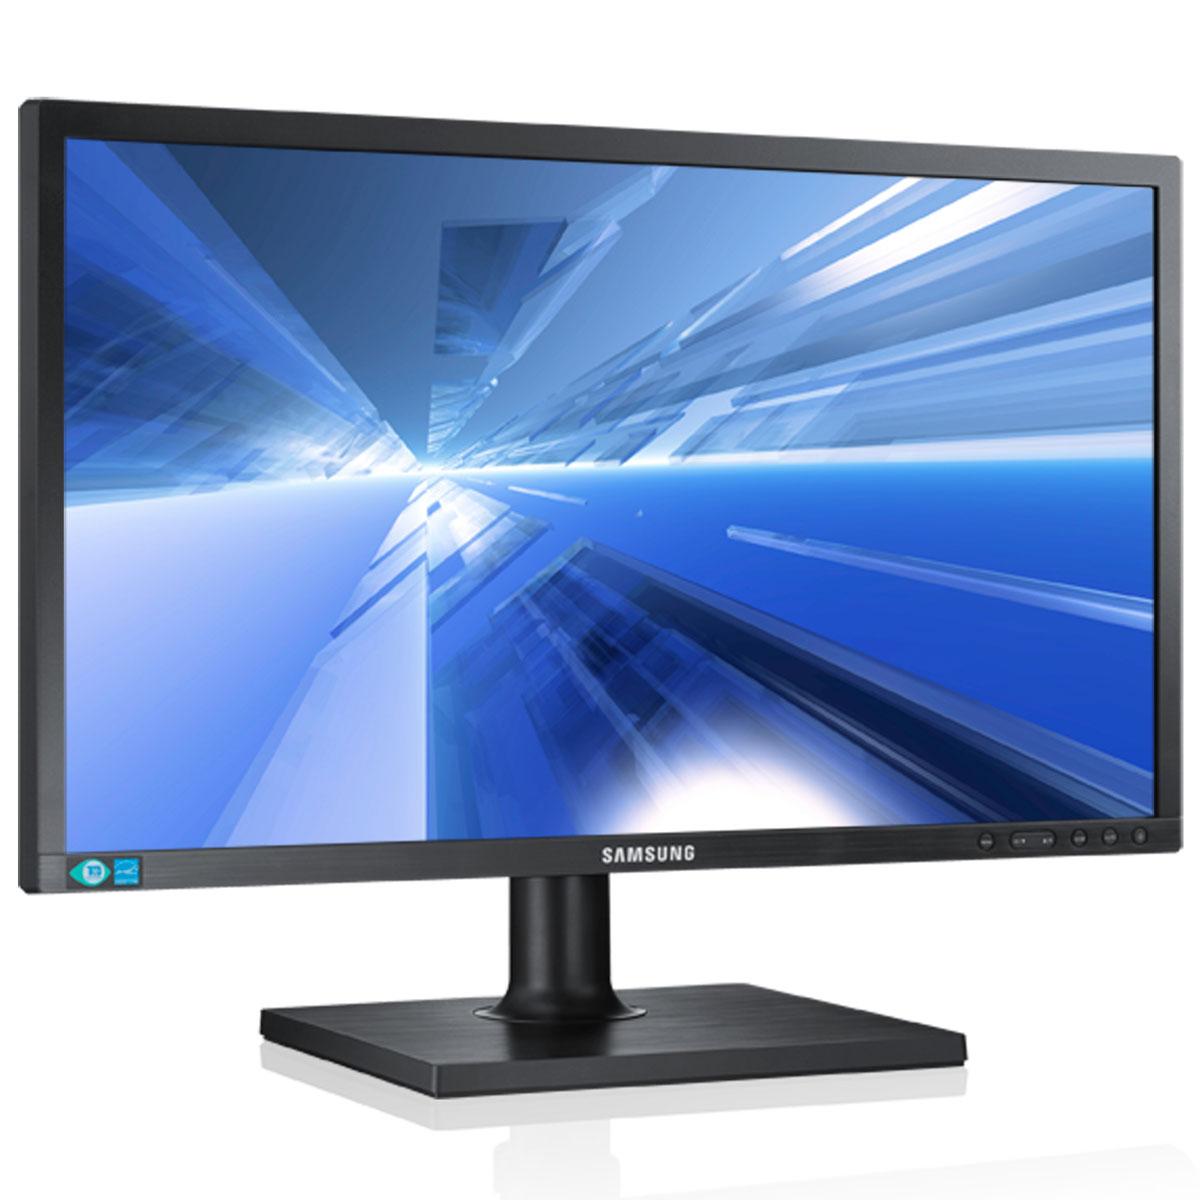 samsung 22 led syncmaster s22c450mw ecran pc samsung sur. Black Bedroom Furniture Sets. Home Design Ideas